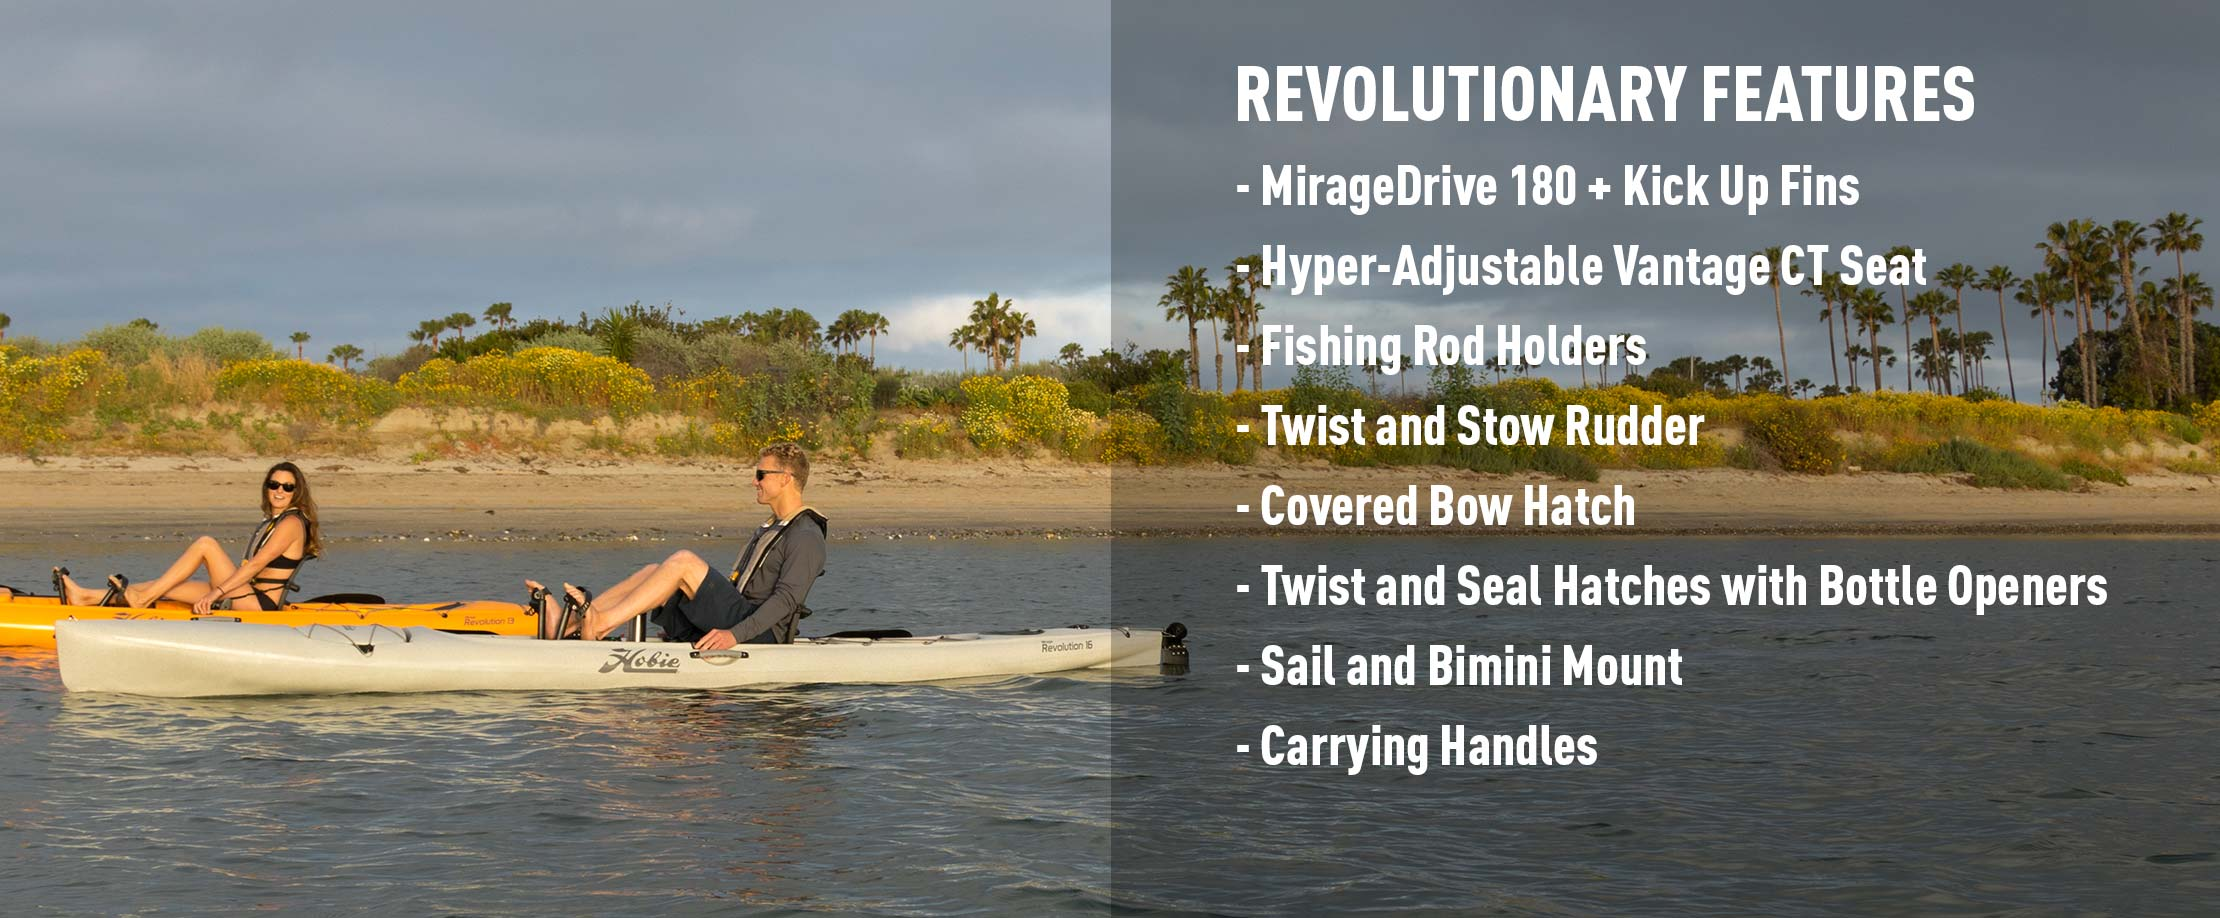 Mirage Revolution 16 Features